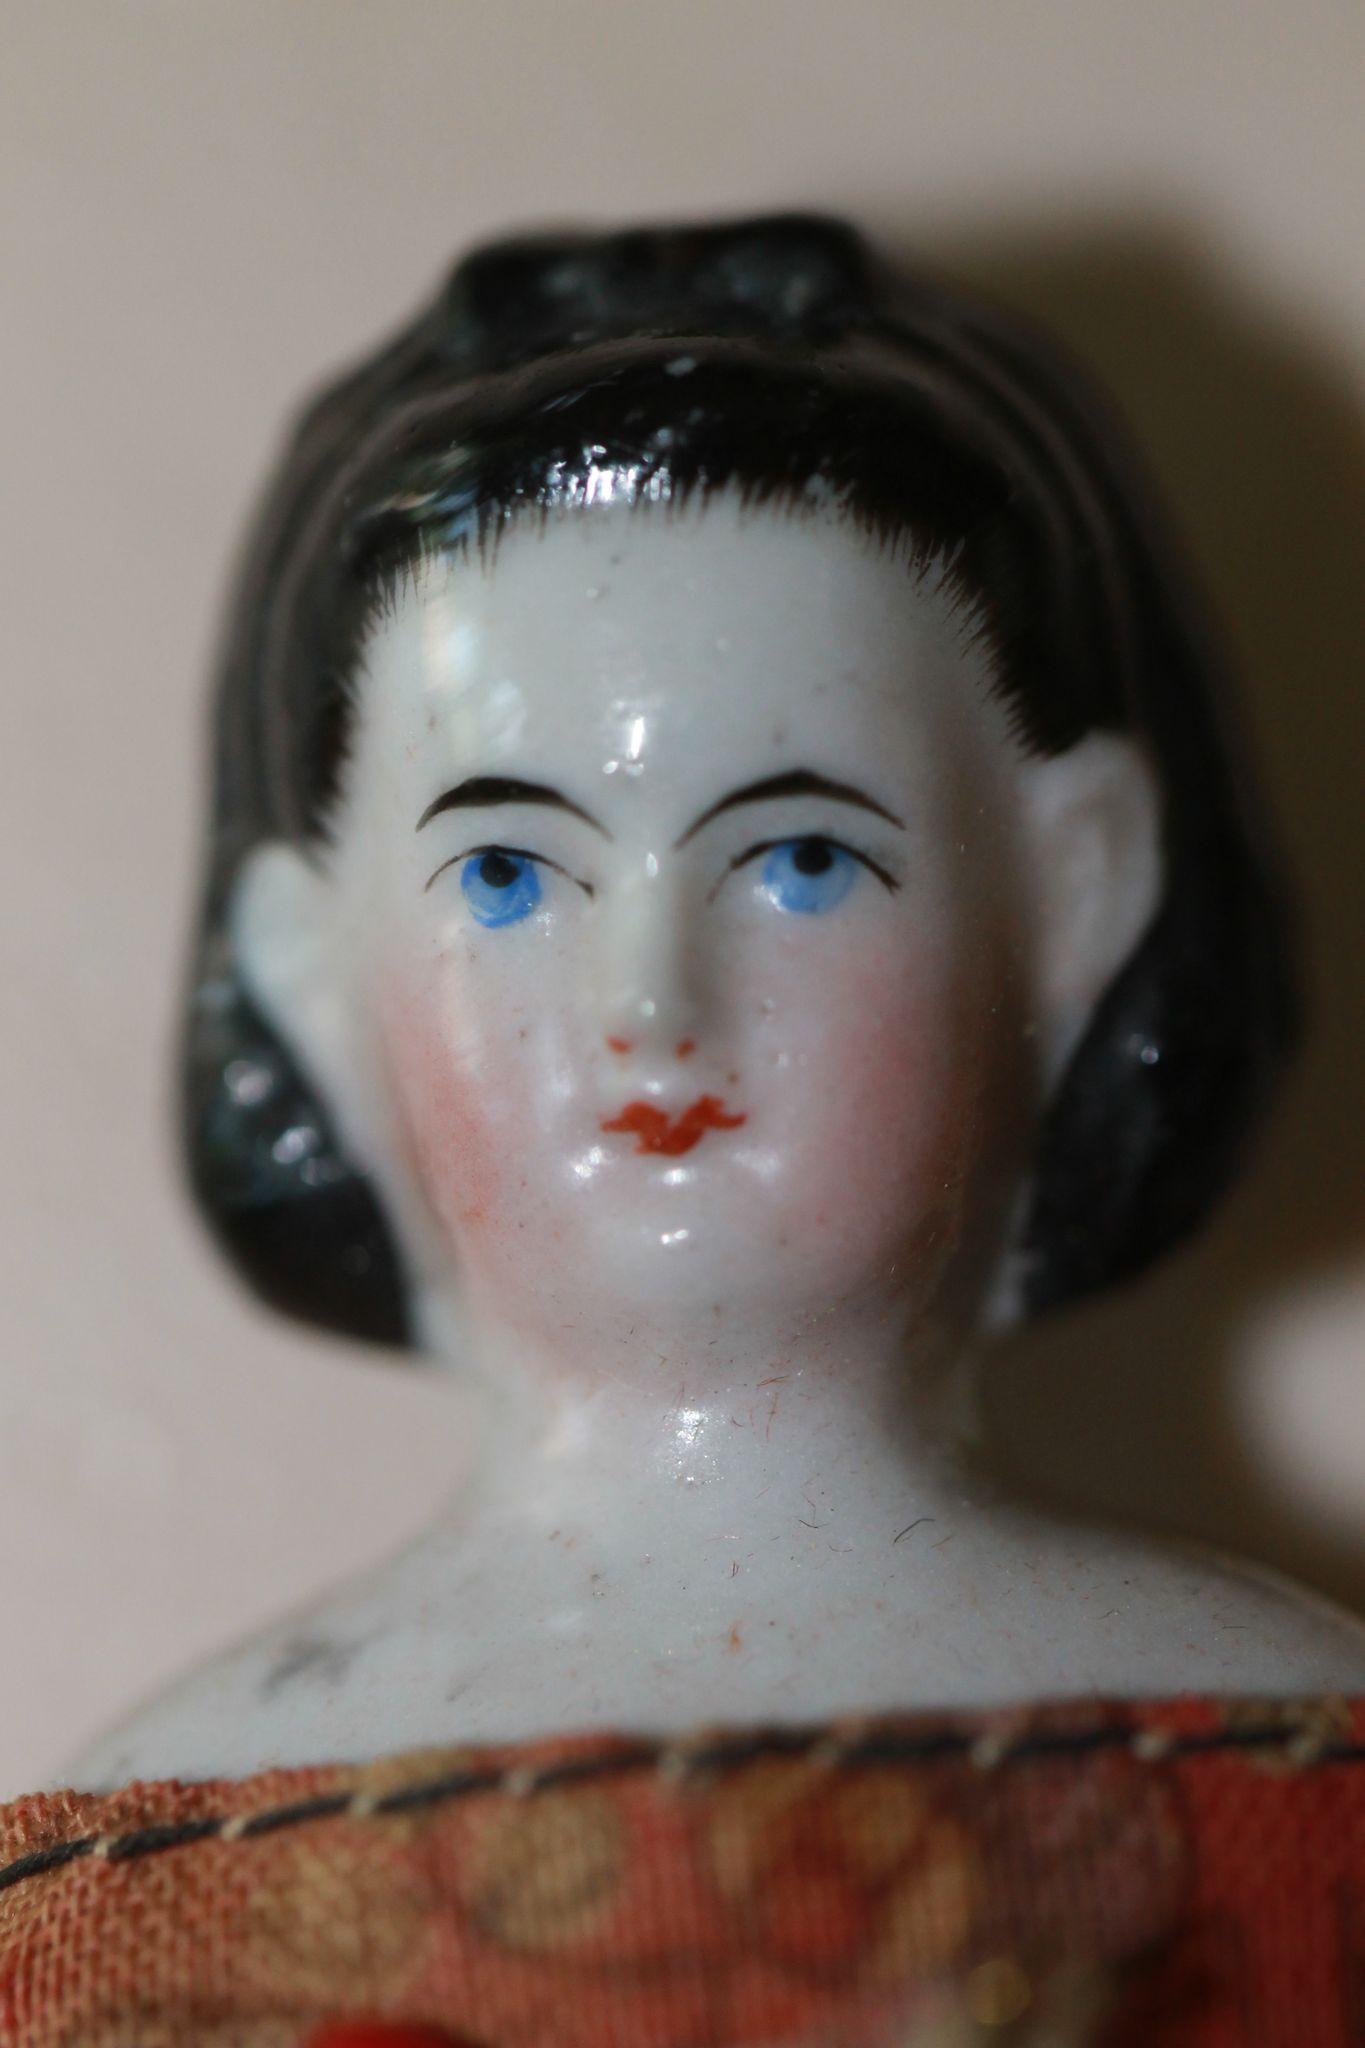 1860s-70s China Doll House Doll Snood, Bow AO